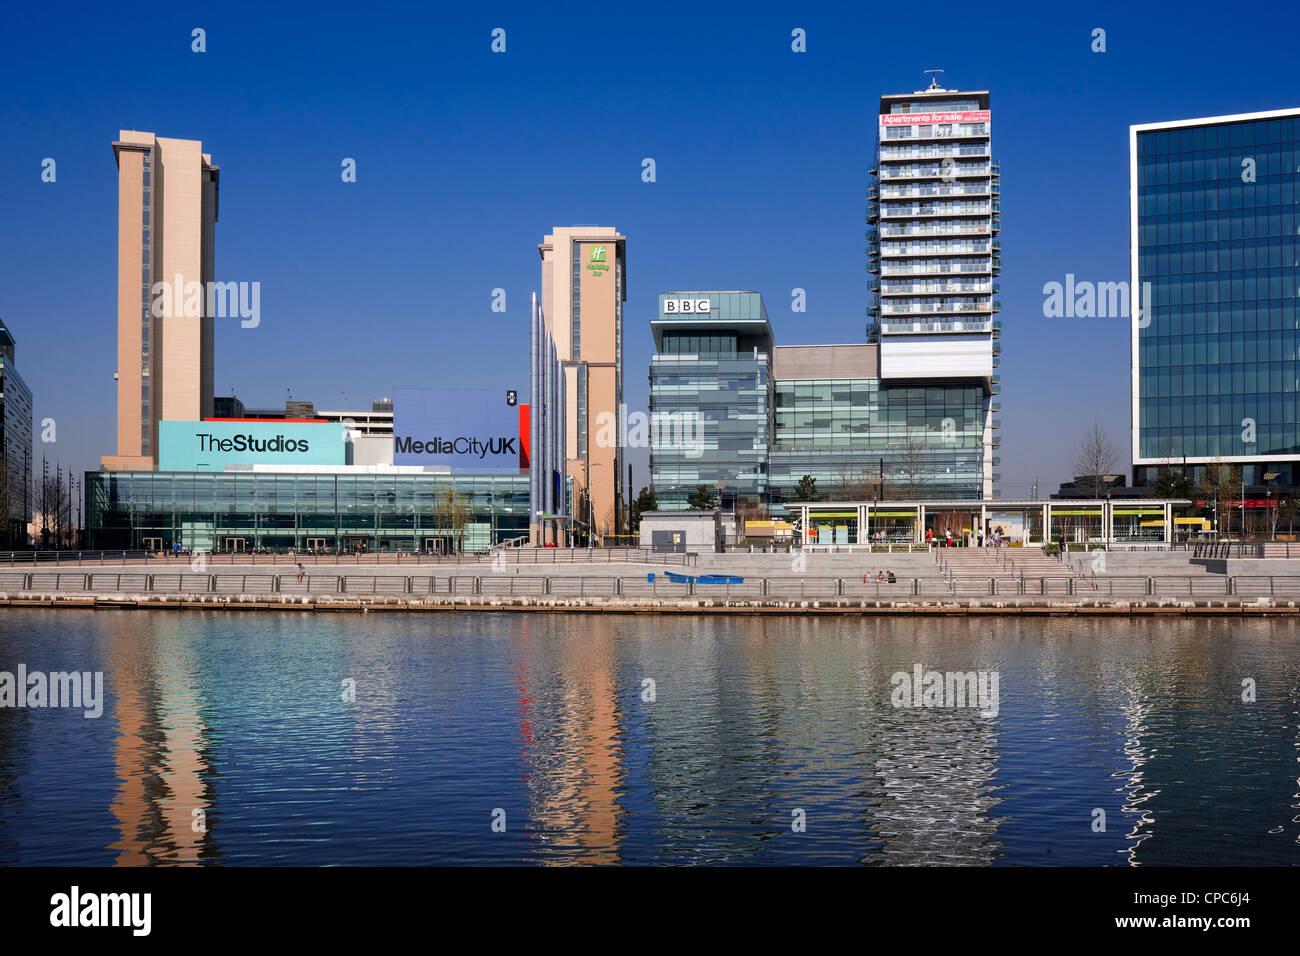 Media City UK, Salford Quays, Manchester - Stock Image